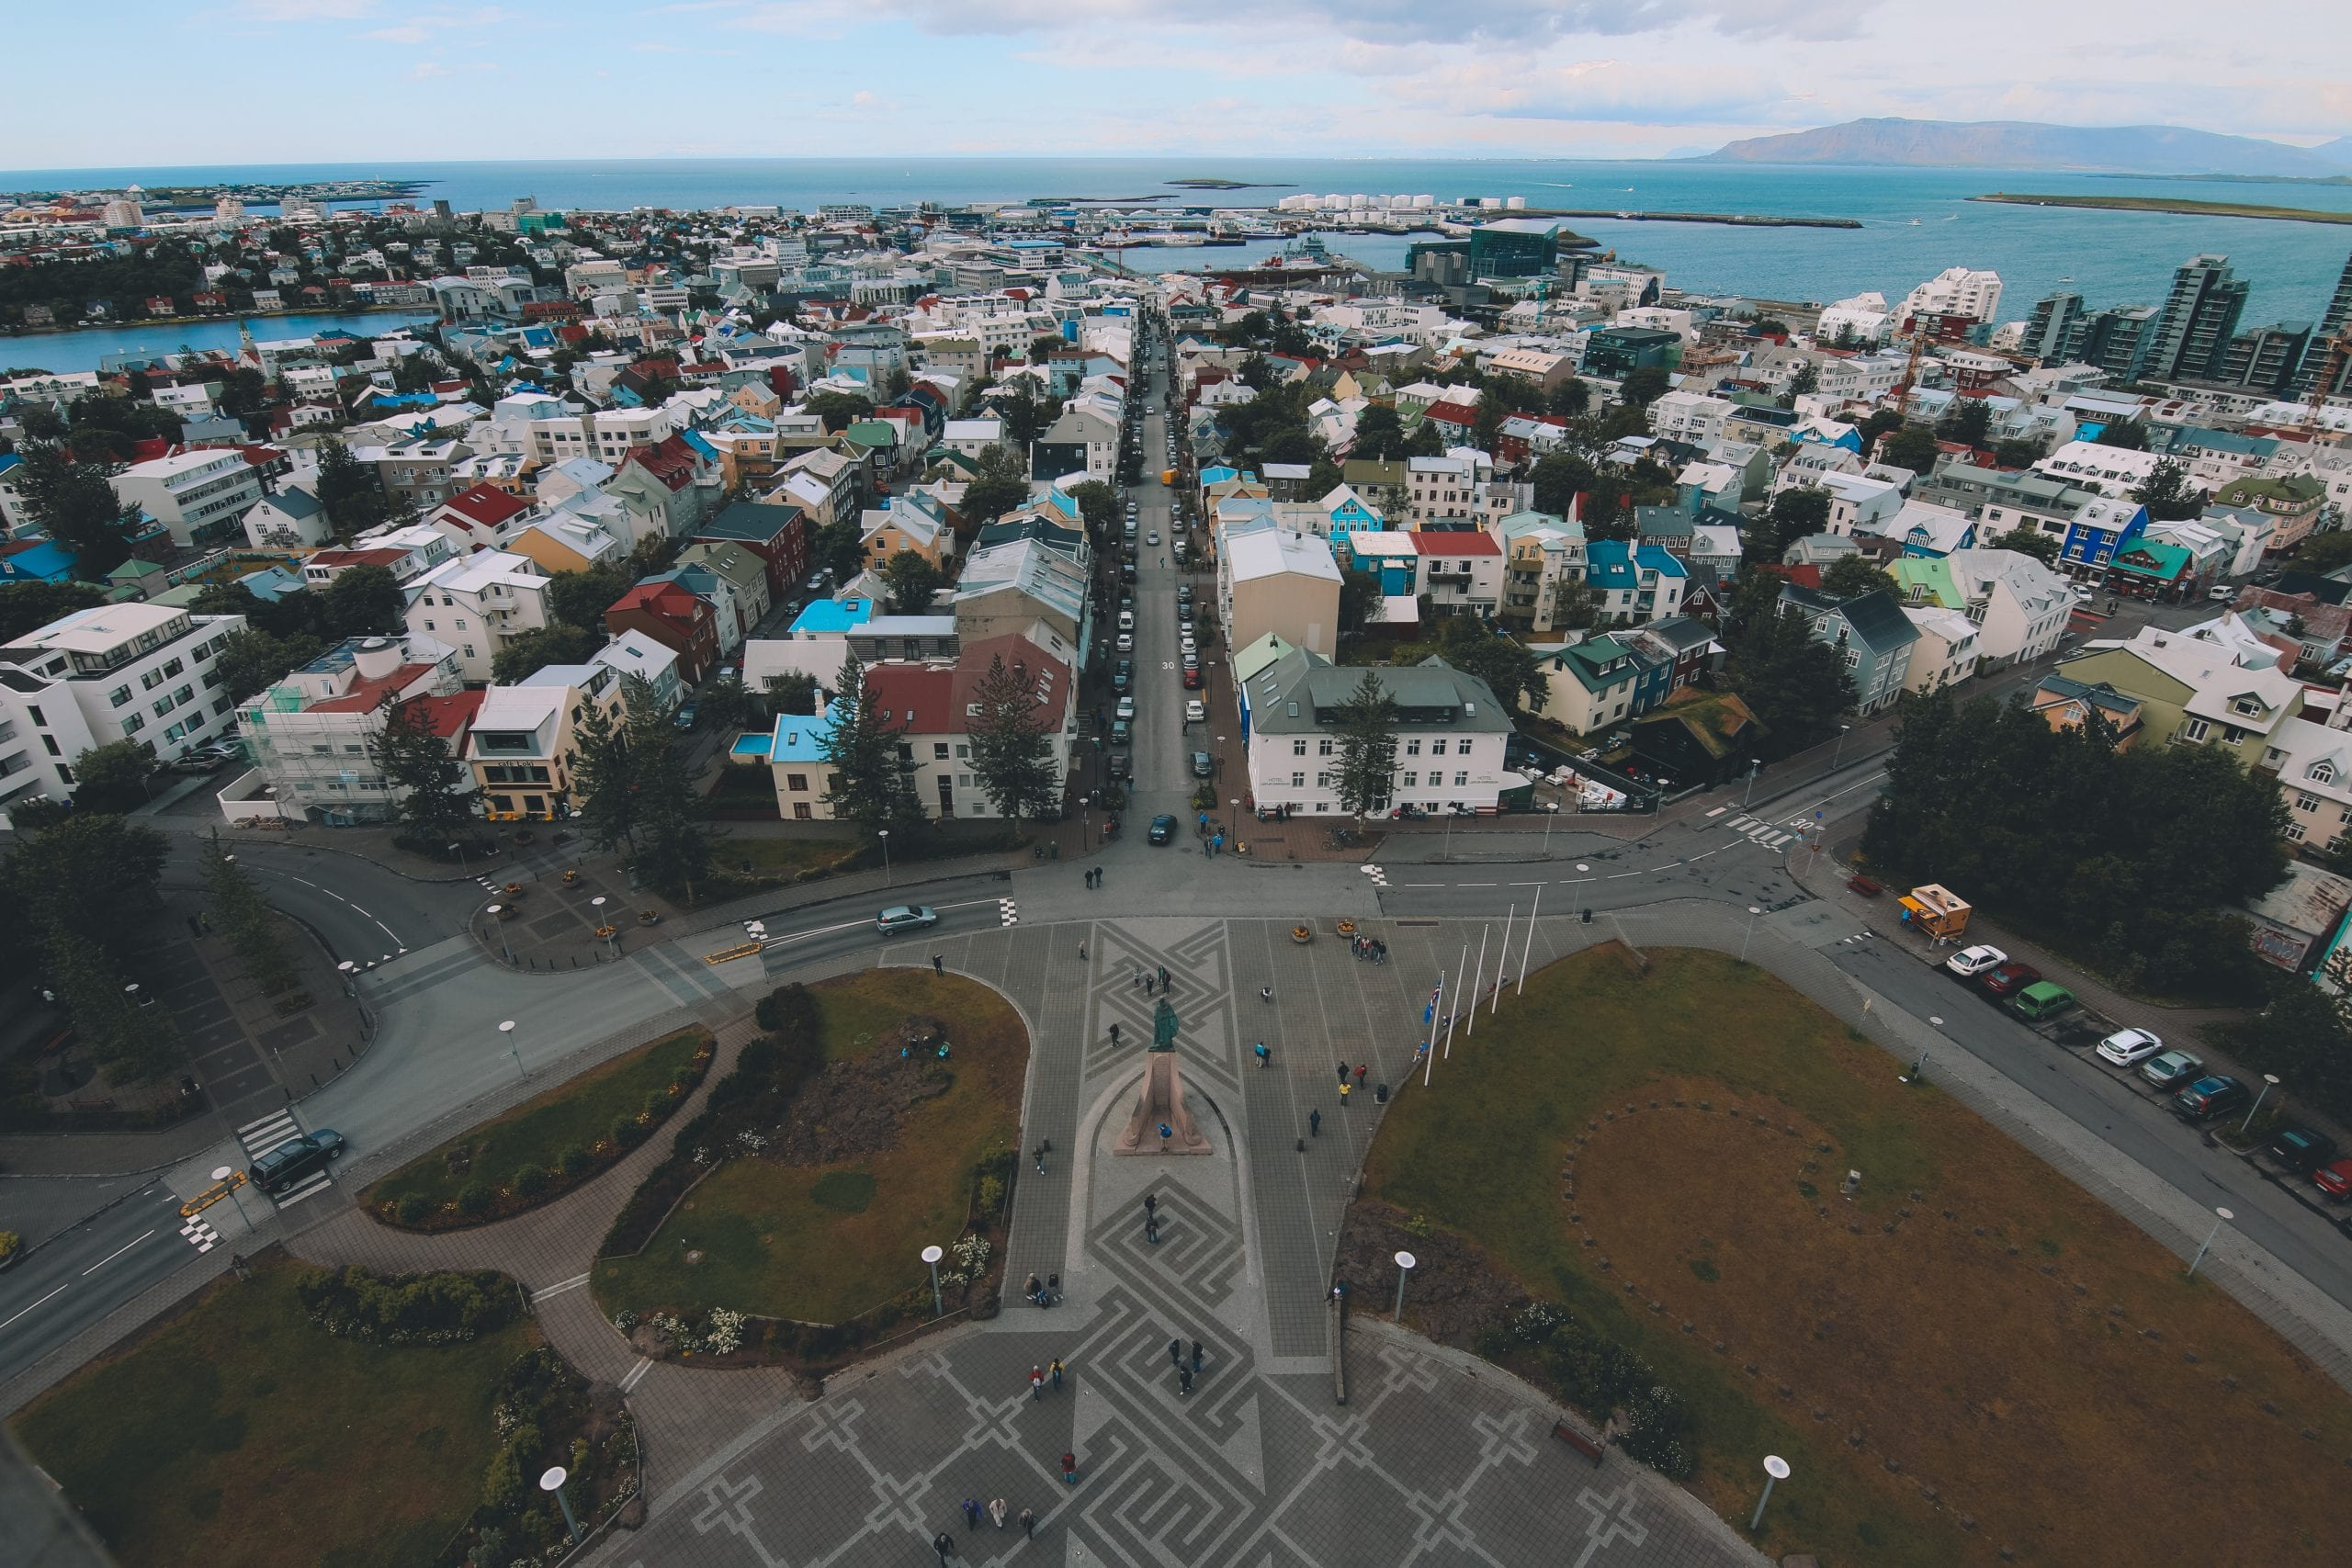 Reykjavik from Hallgrimskirkja tower